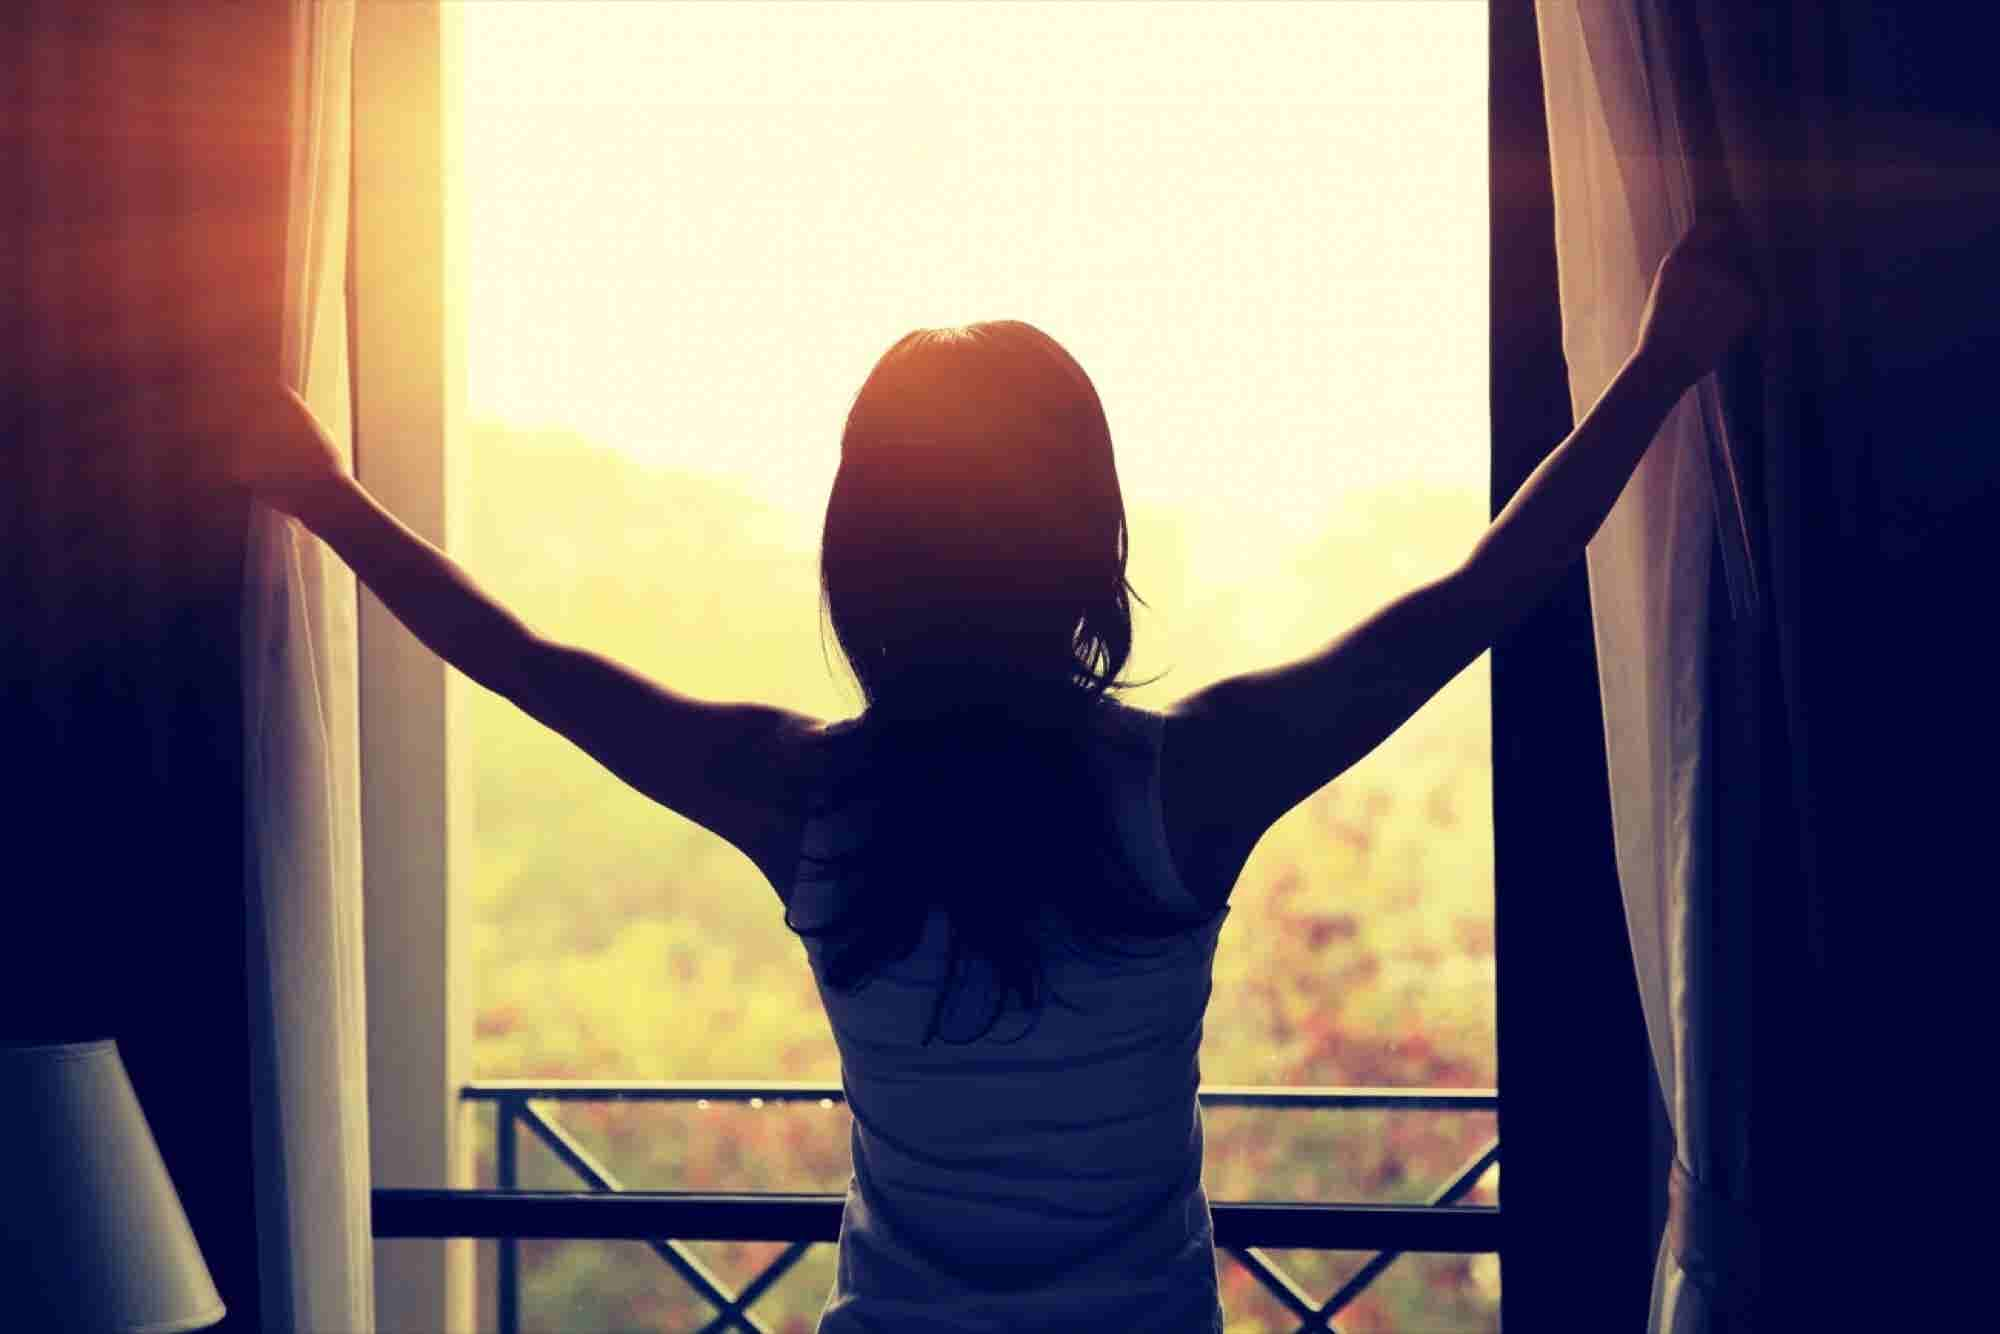 Meet Fear's Antidote: Hope